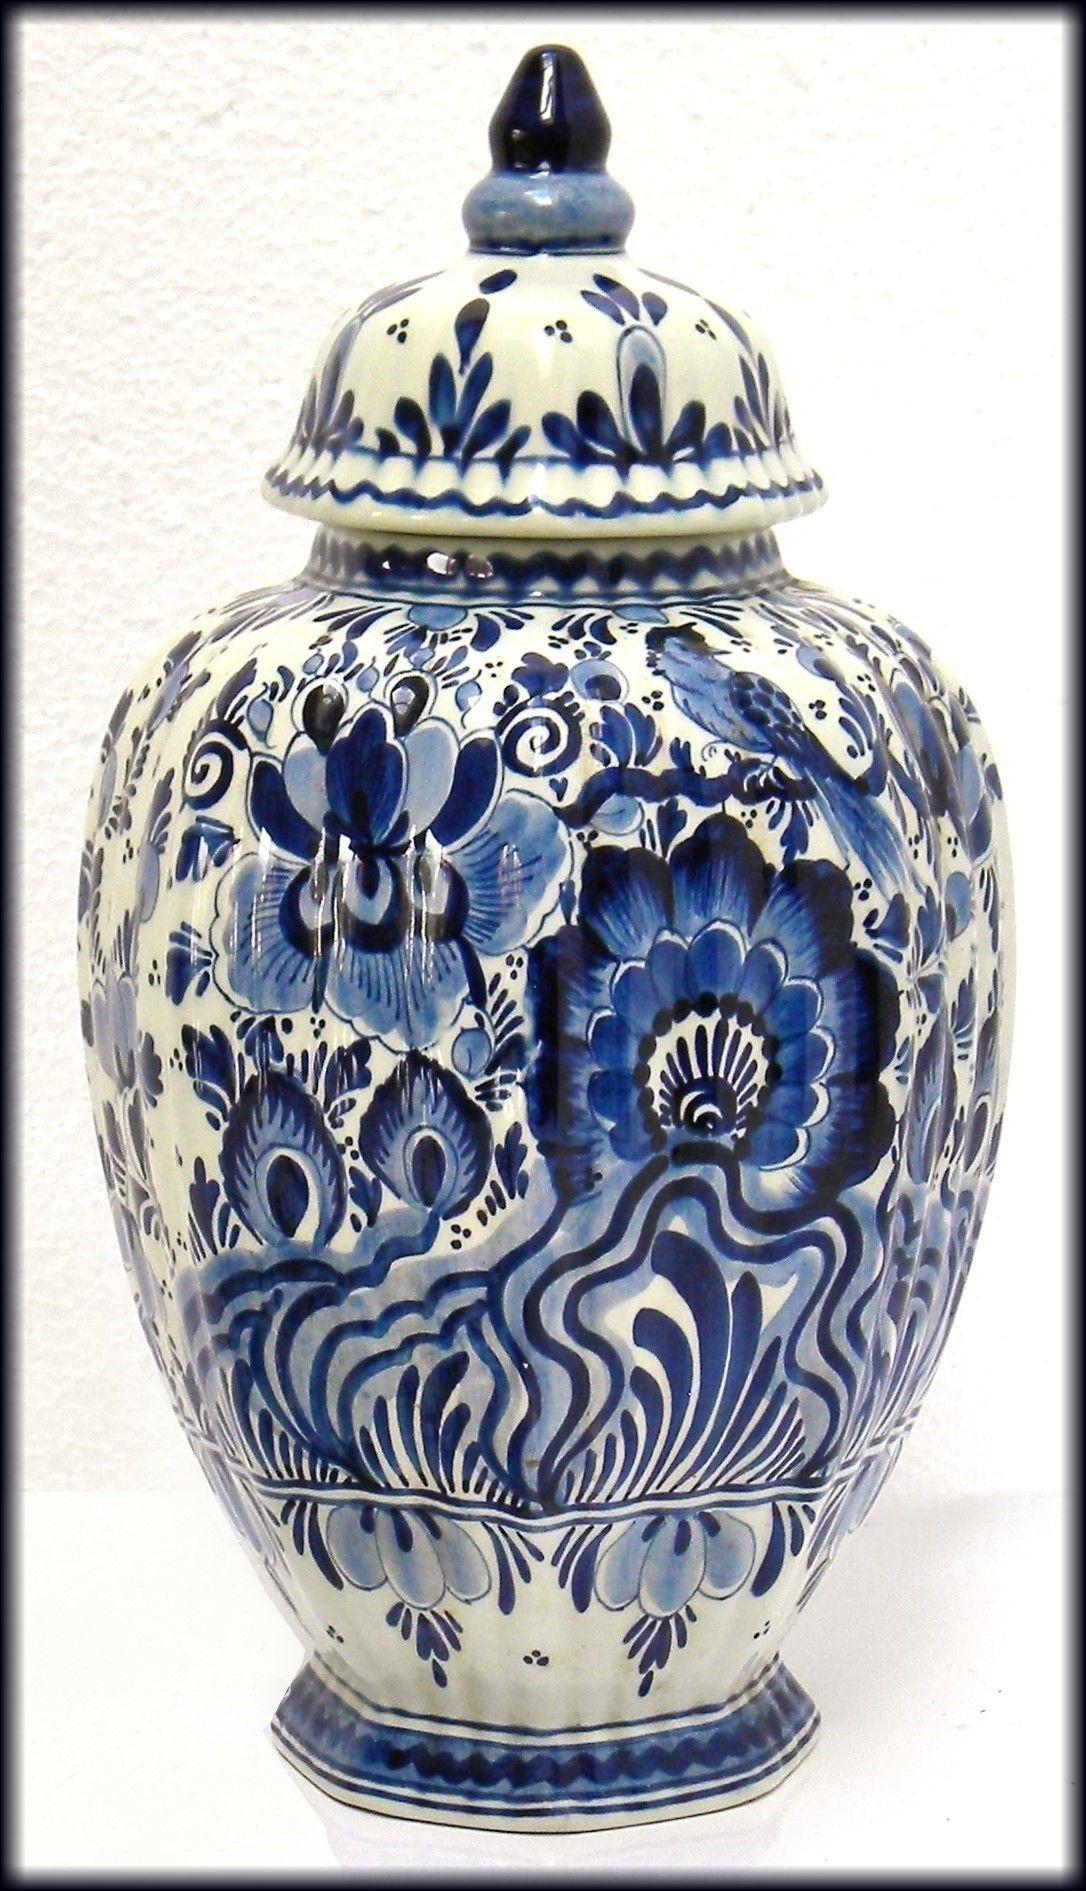 diamond shaped vase of vintage delft blue ceramic vase jar hand painted cobalt blue floral pertaining to amazing delft blue vintage dutch art pottery with cobalt blue bird and floral decoration